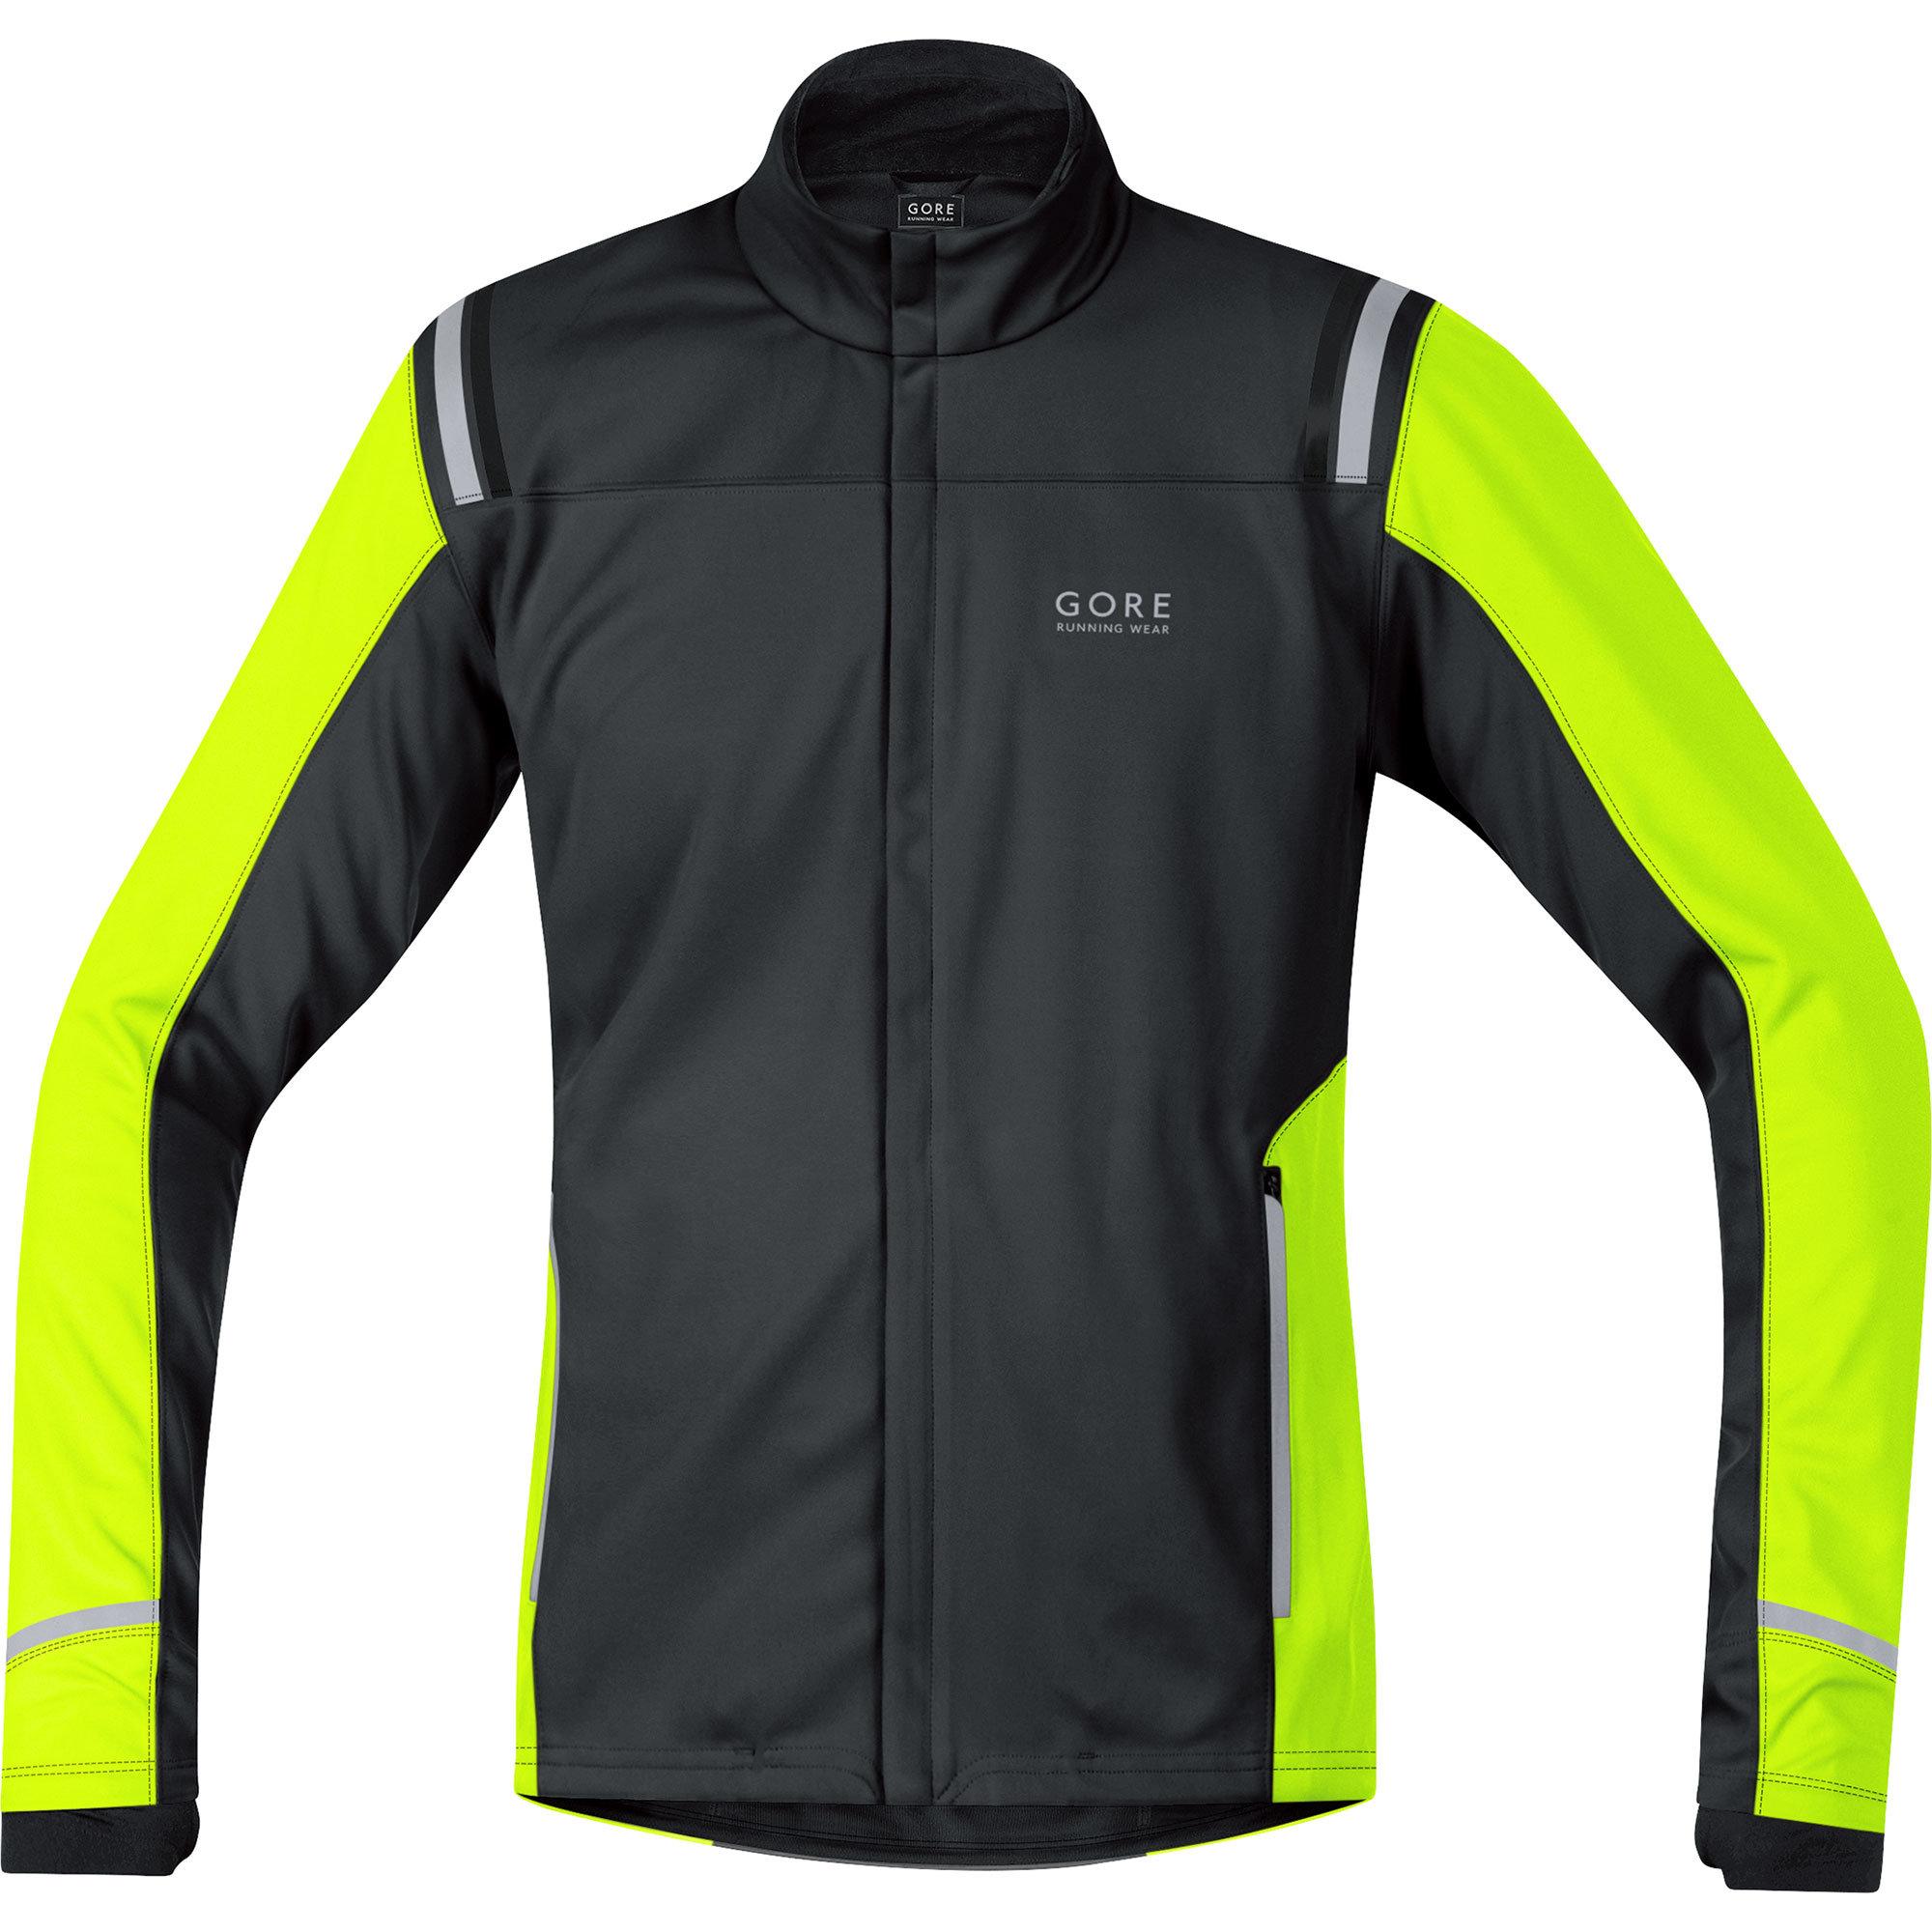 Gore Mythos 2.0 WS SO Jacket in Schwarz, Gelb